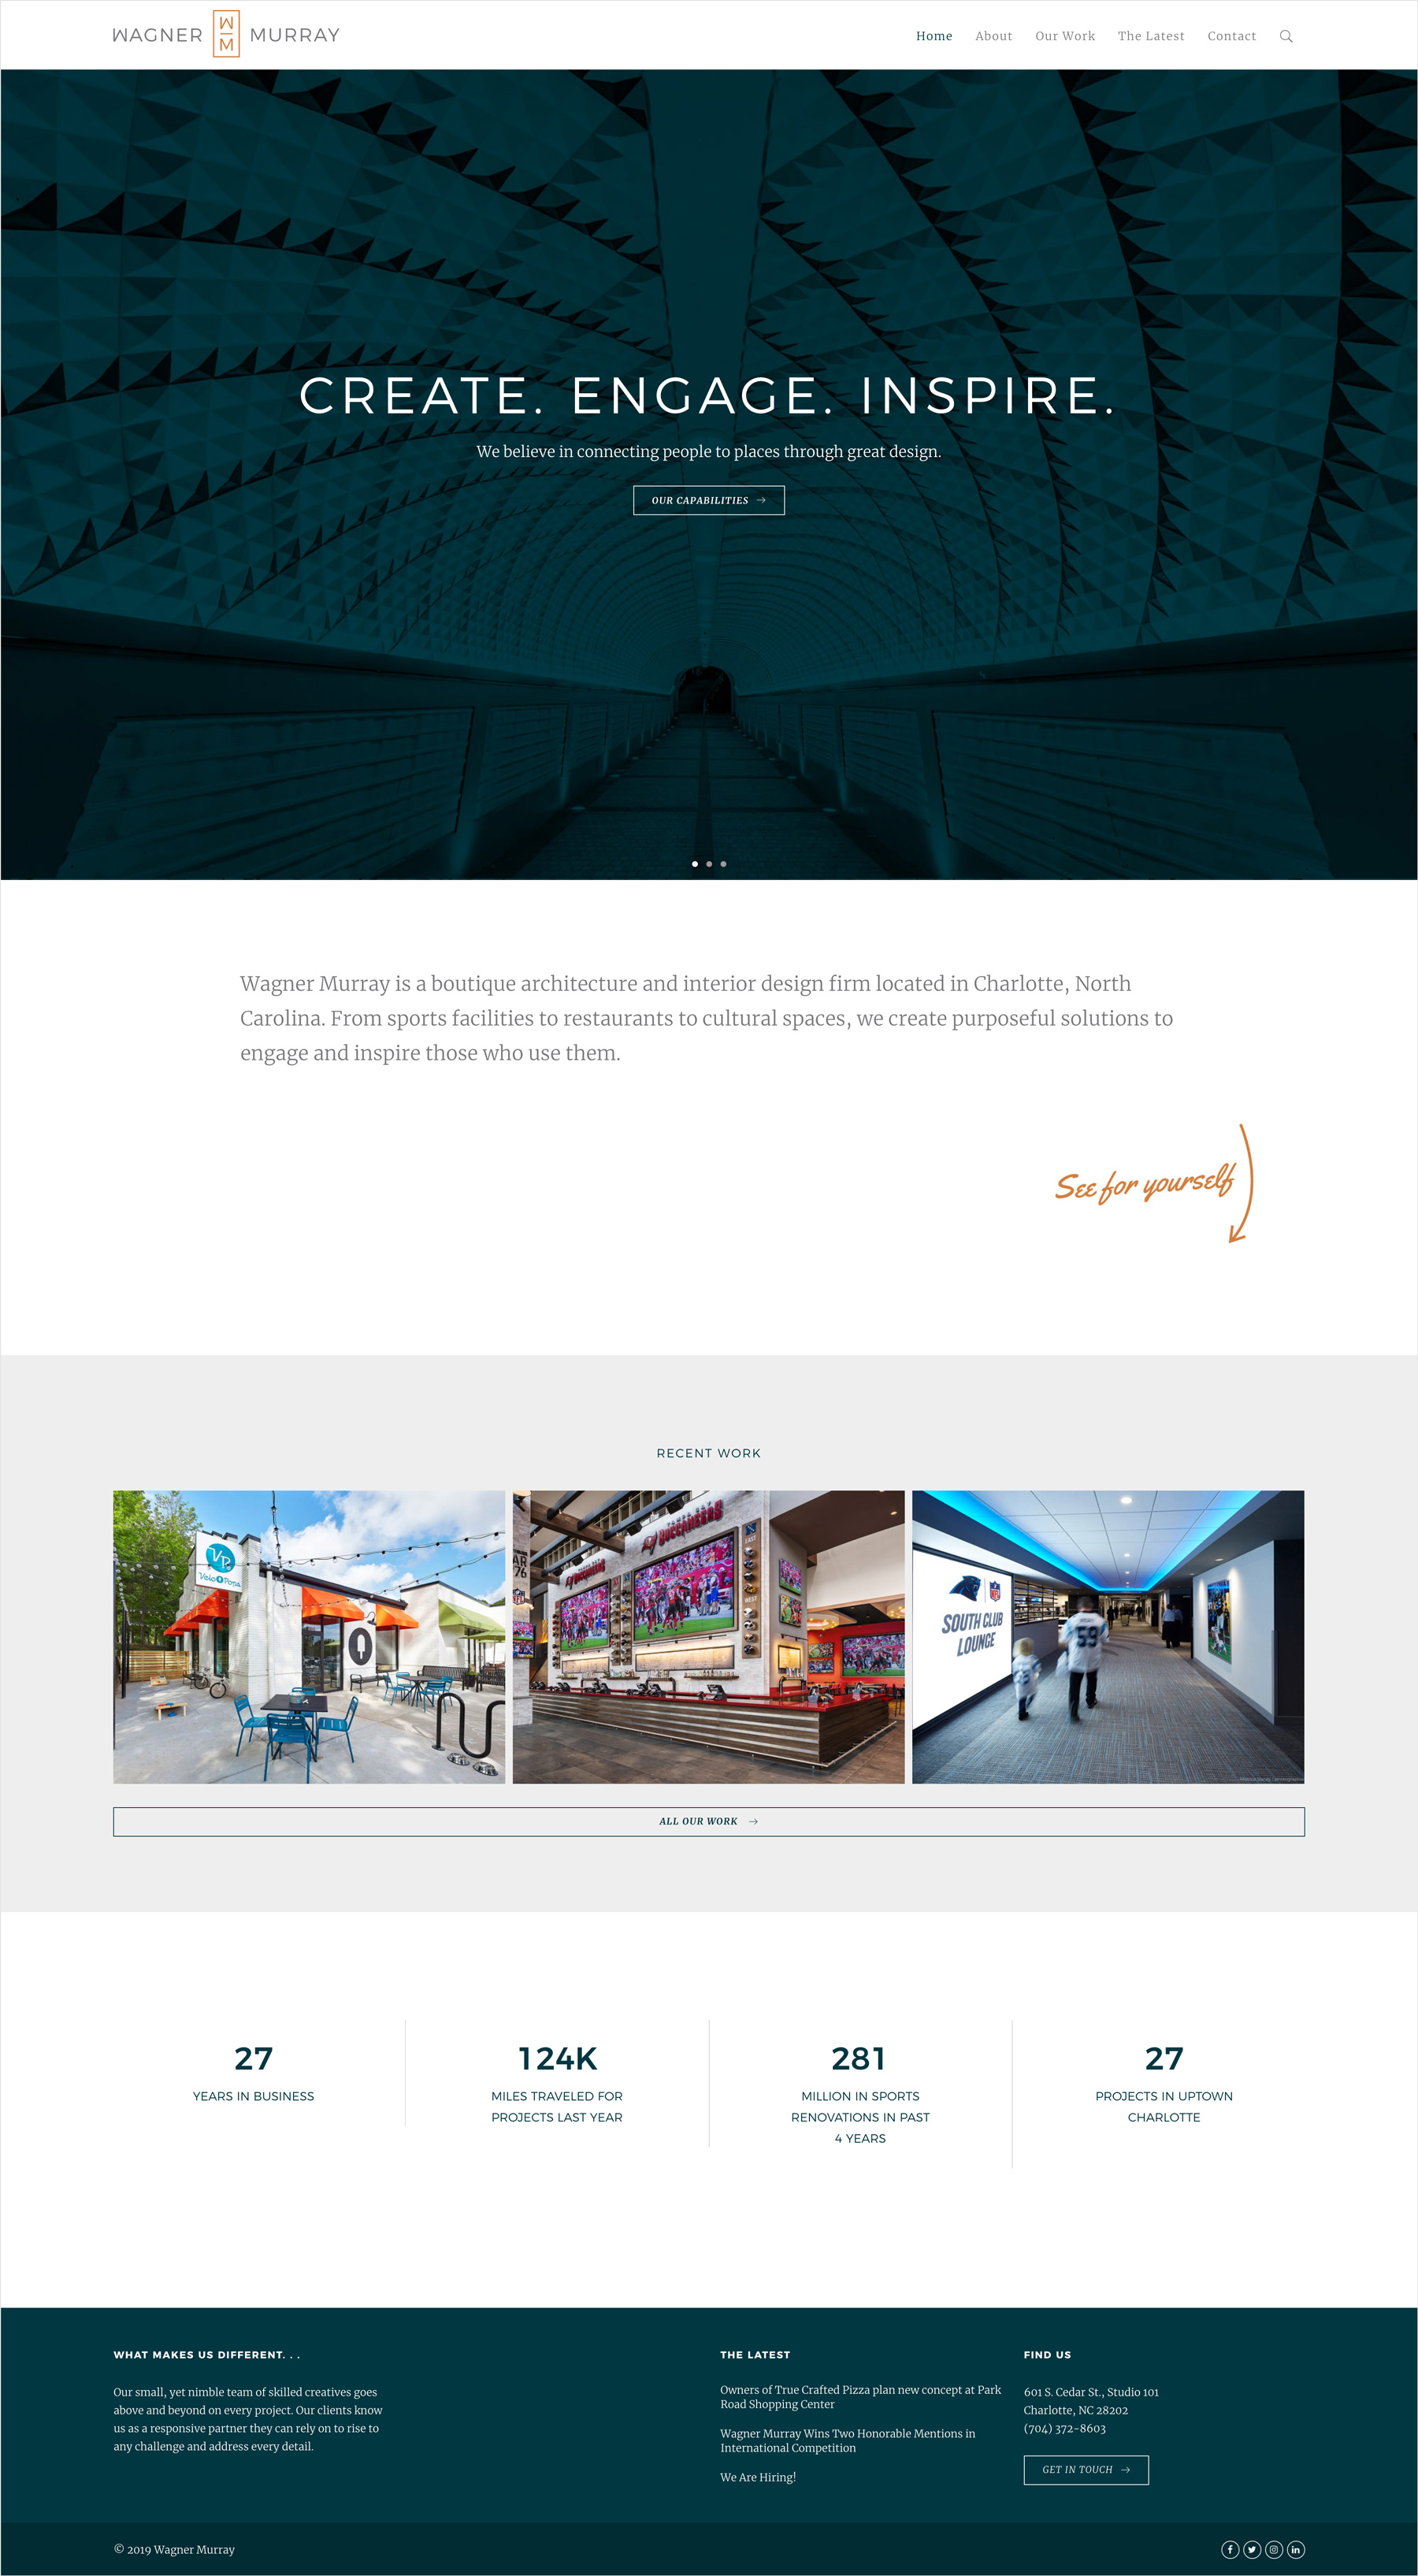 Wagner Murray Homepage